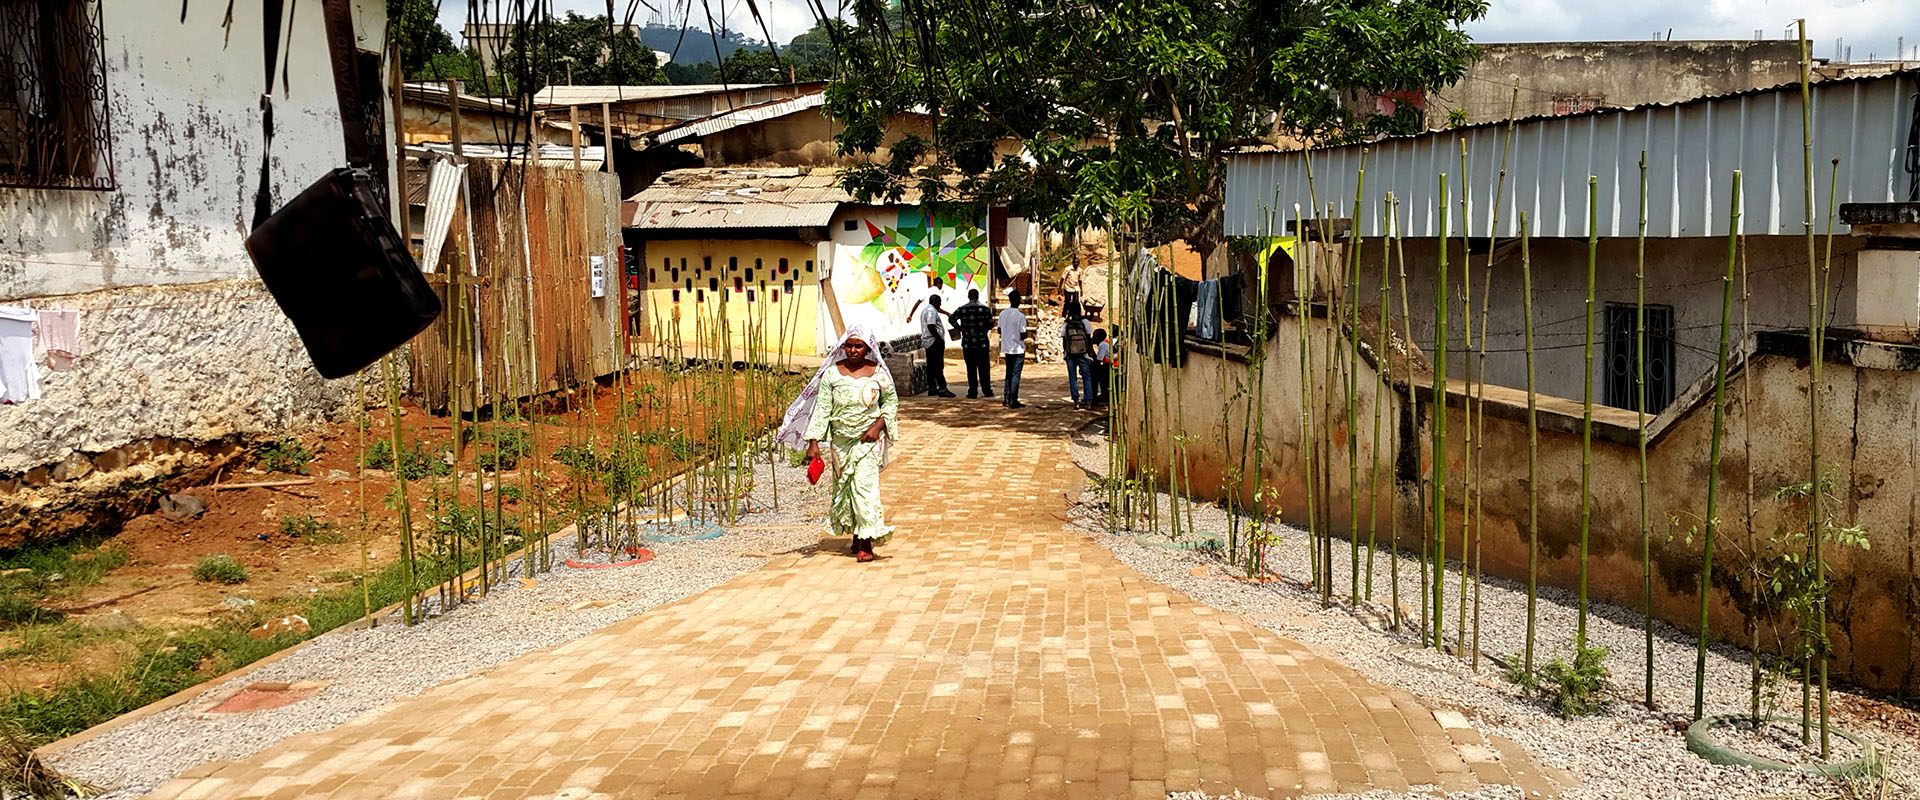 AIRA - 1_barla_architectes_yaounde_cameroun